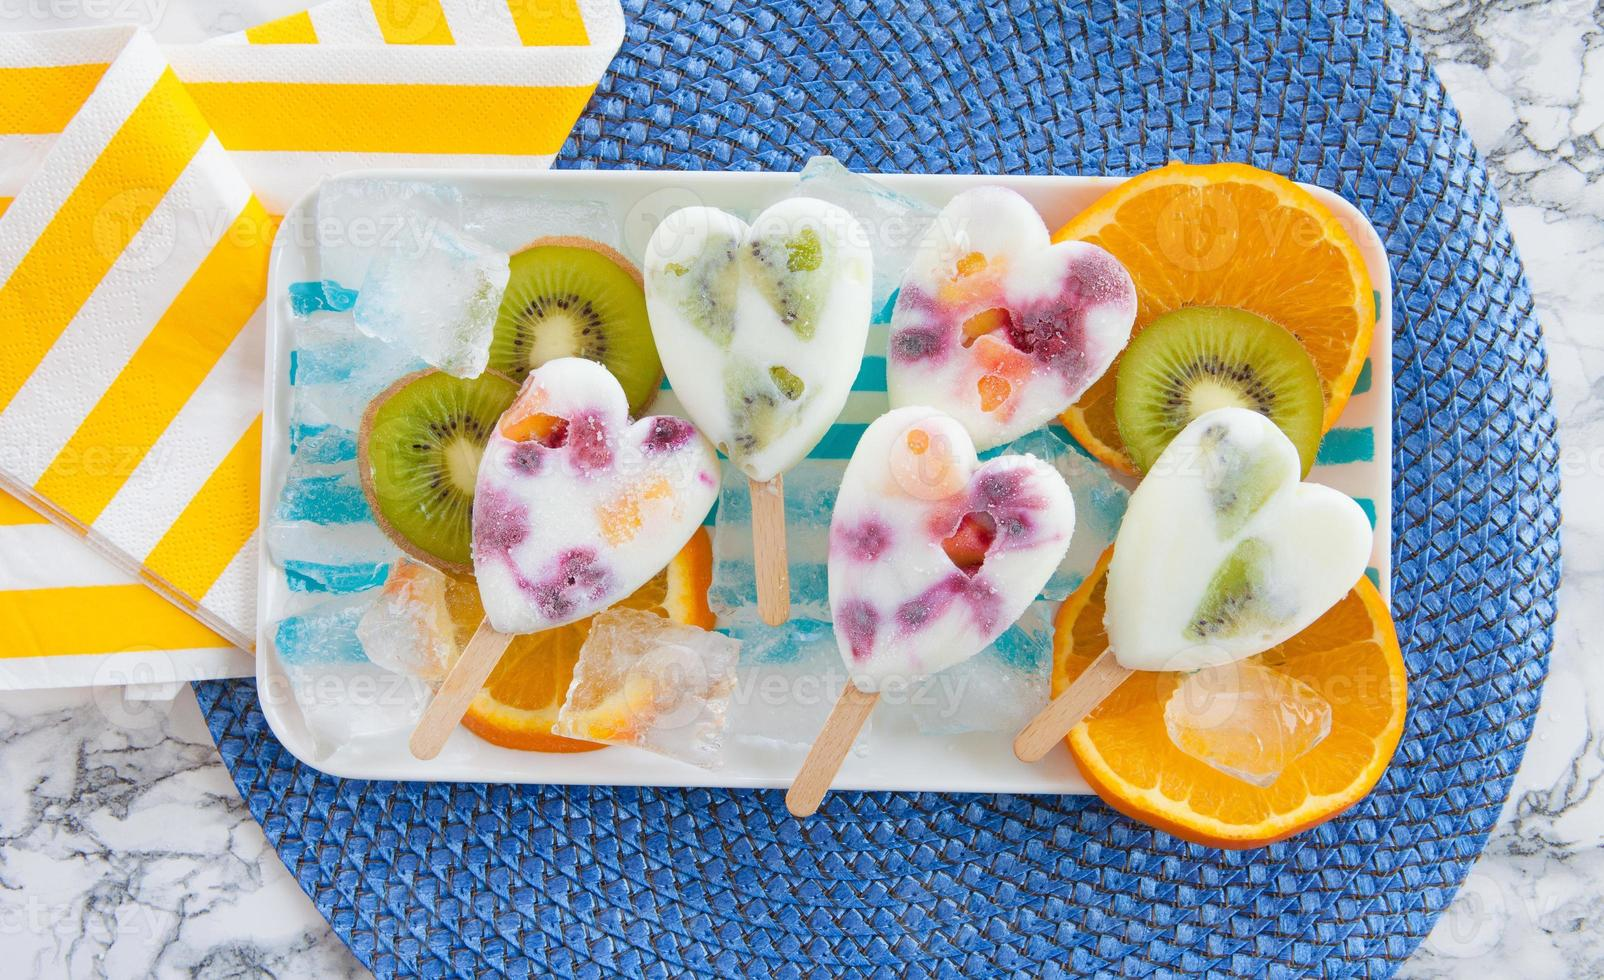 hemlagade frysta popsicles foto